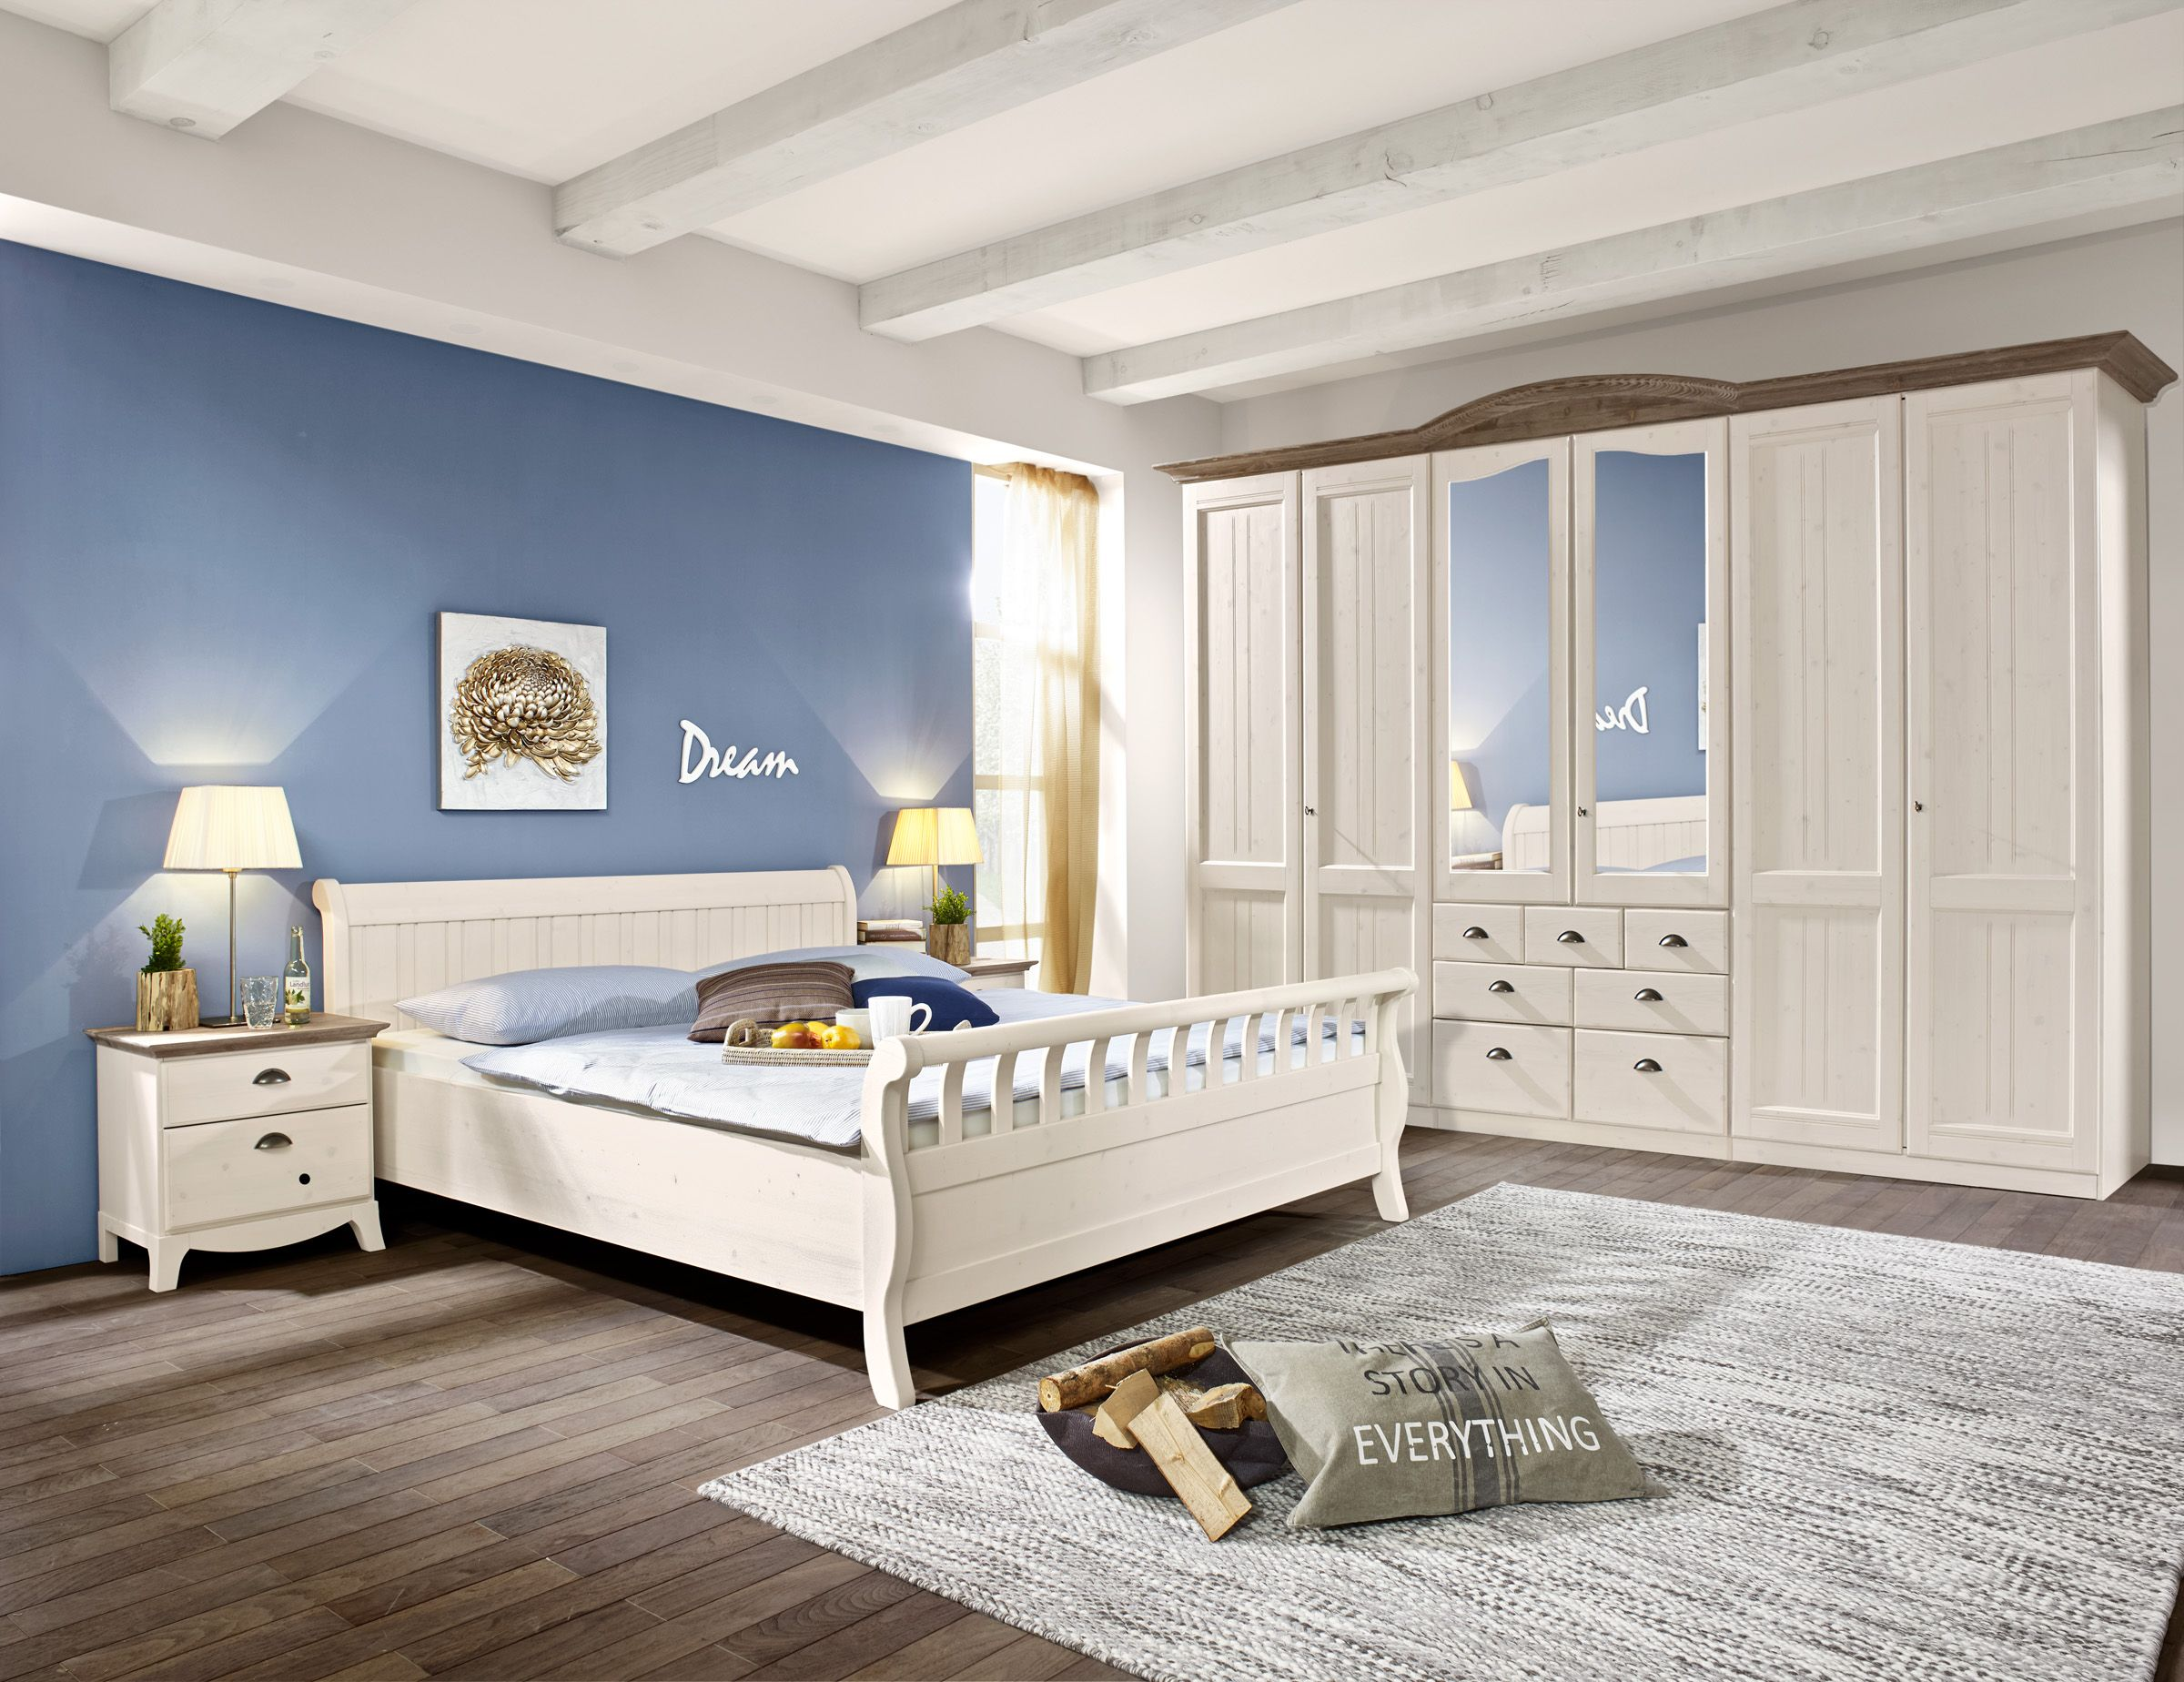 Wellemöbel Schlafzimmer ~ Best schlafzimmer bedroom images bedroom